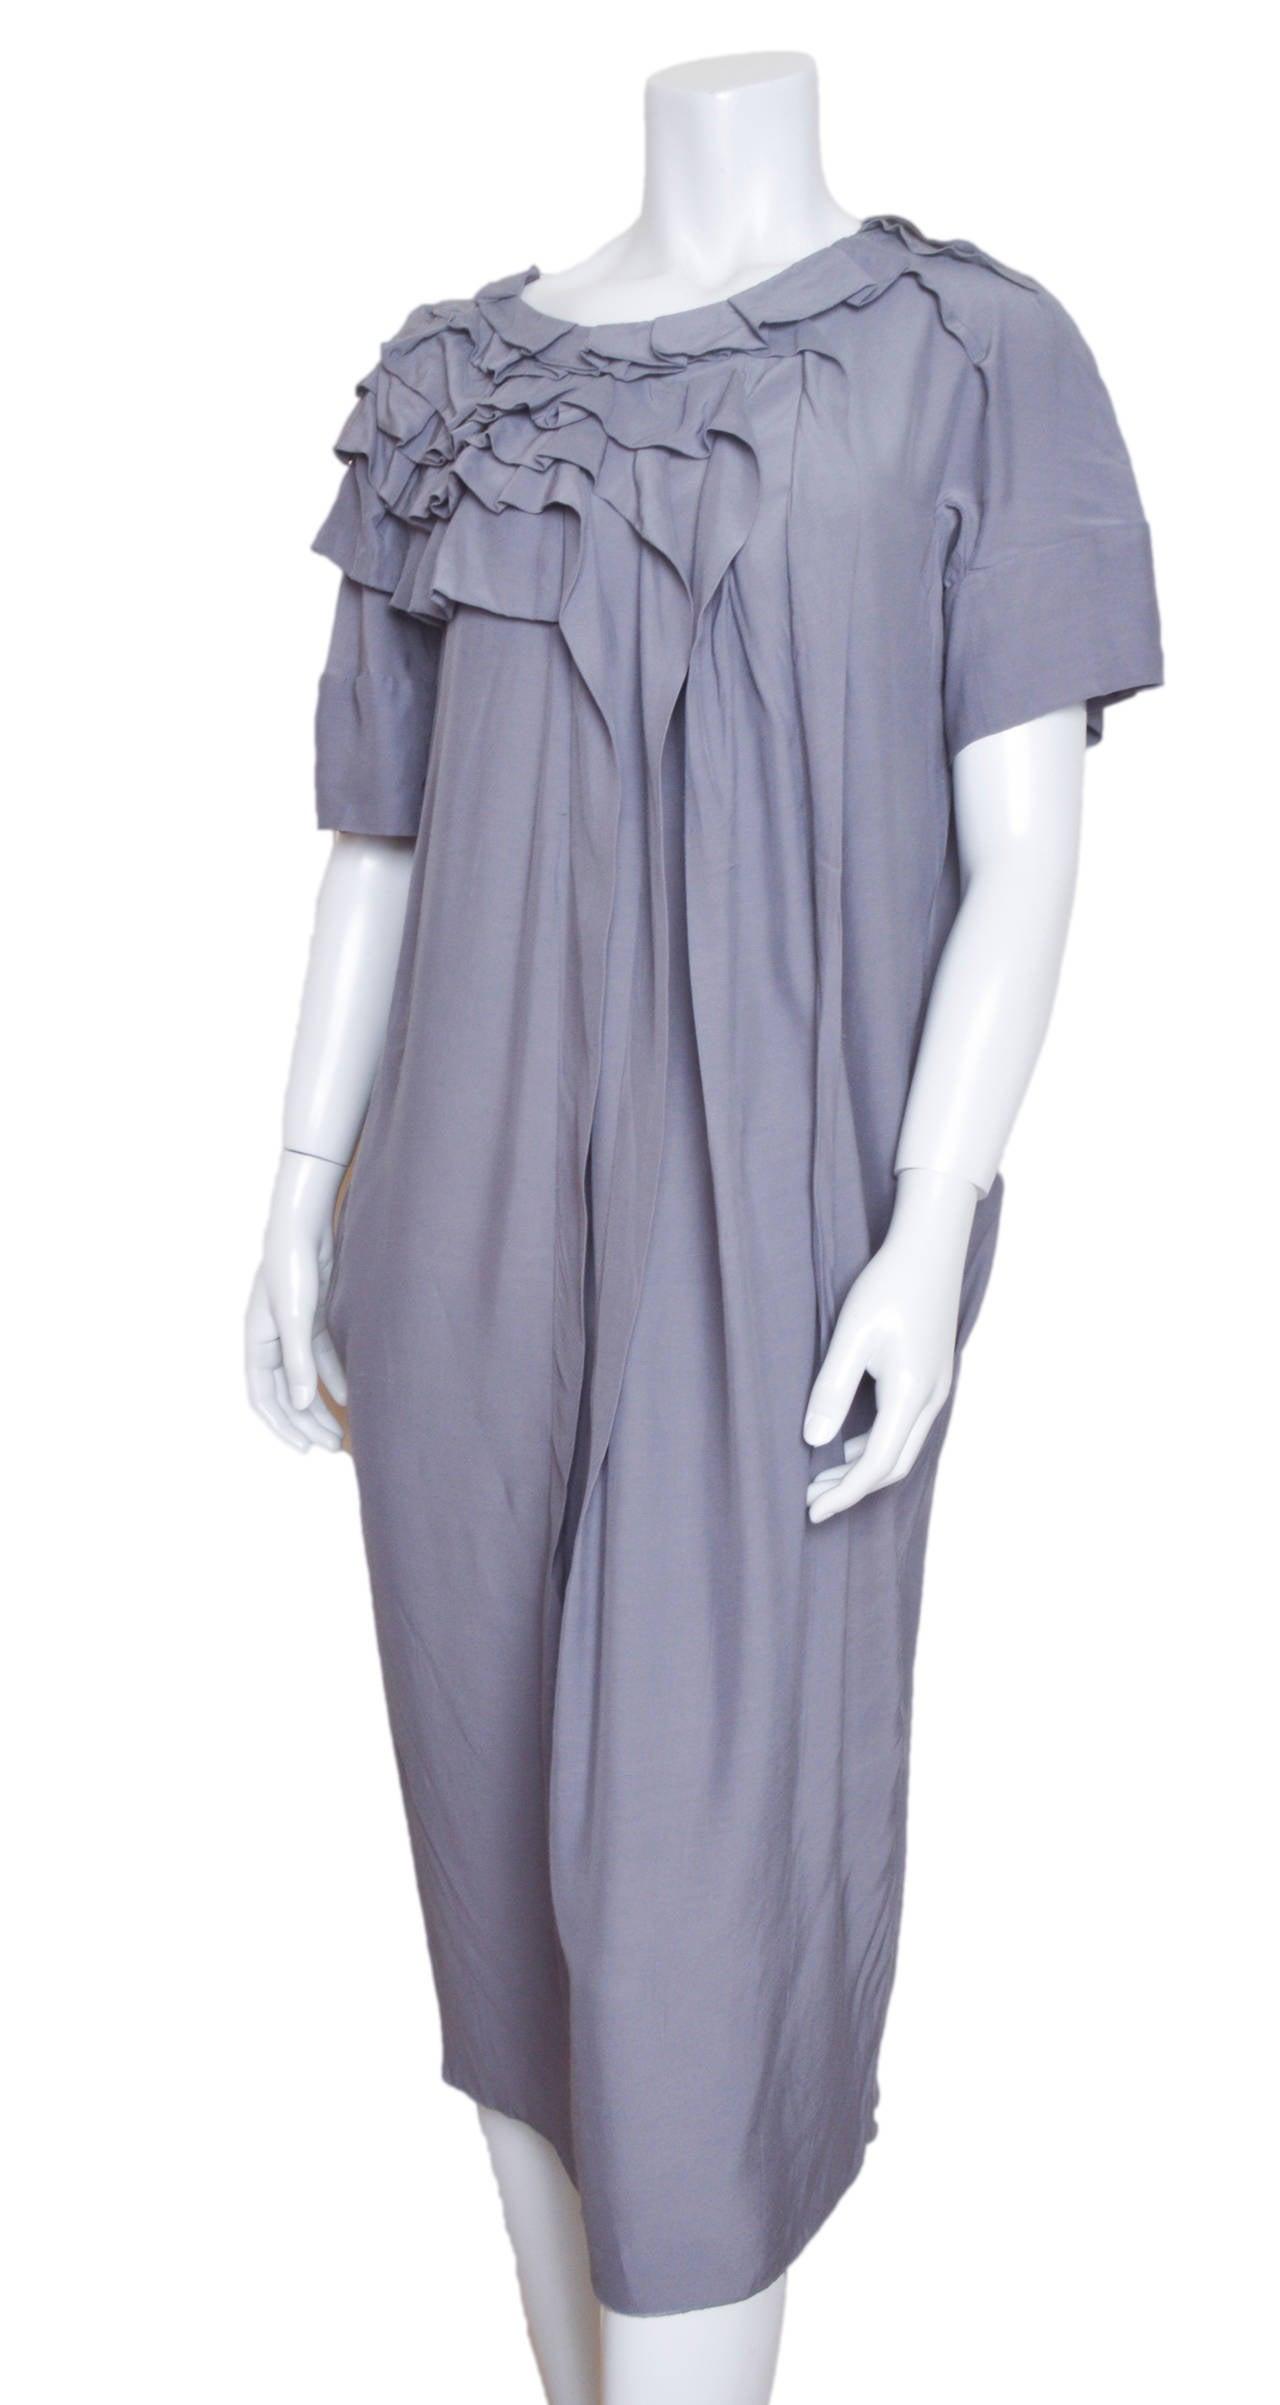 Marni Gray Ruffle Shift Dress Size 42 For Sale 1